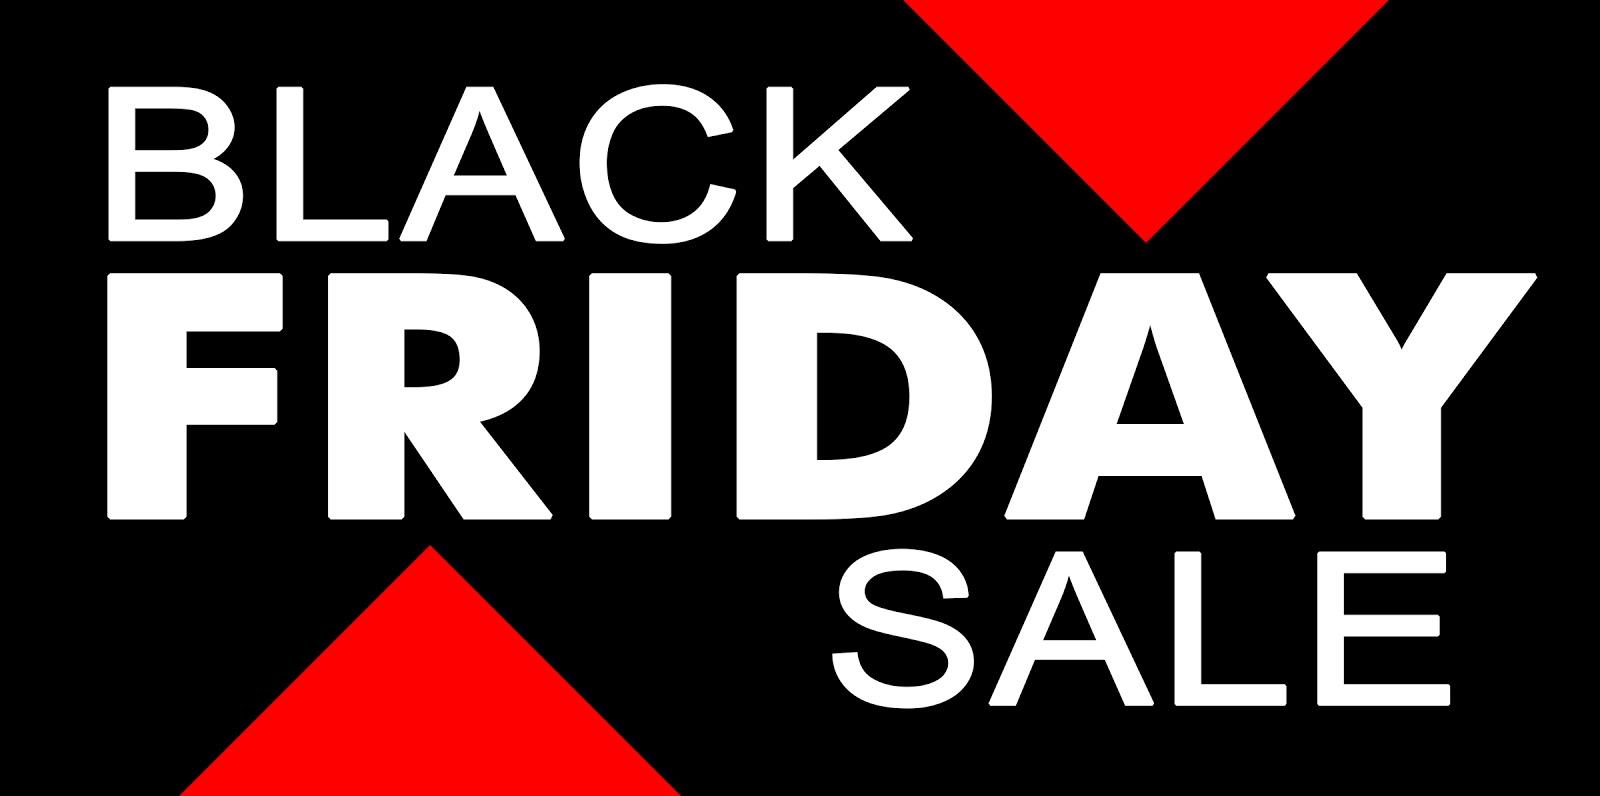 black-friday-sale-red-kb.jpg